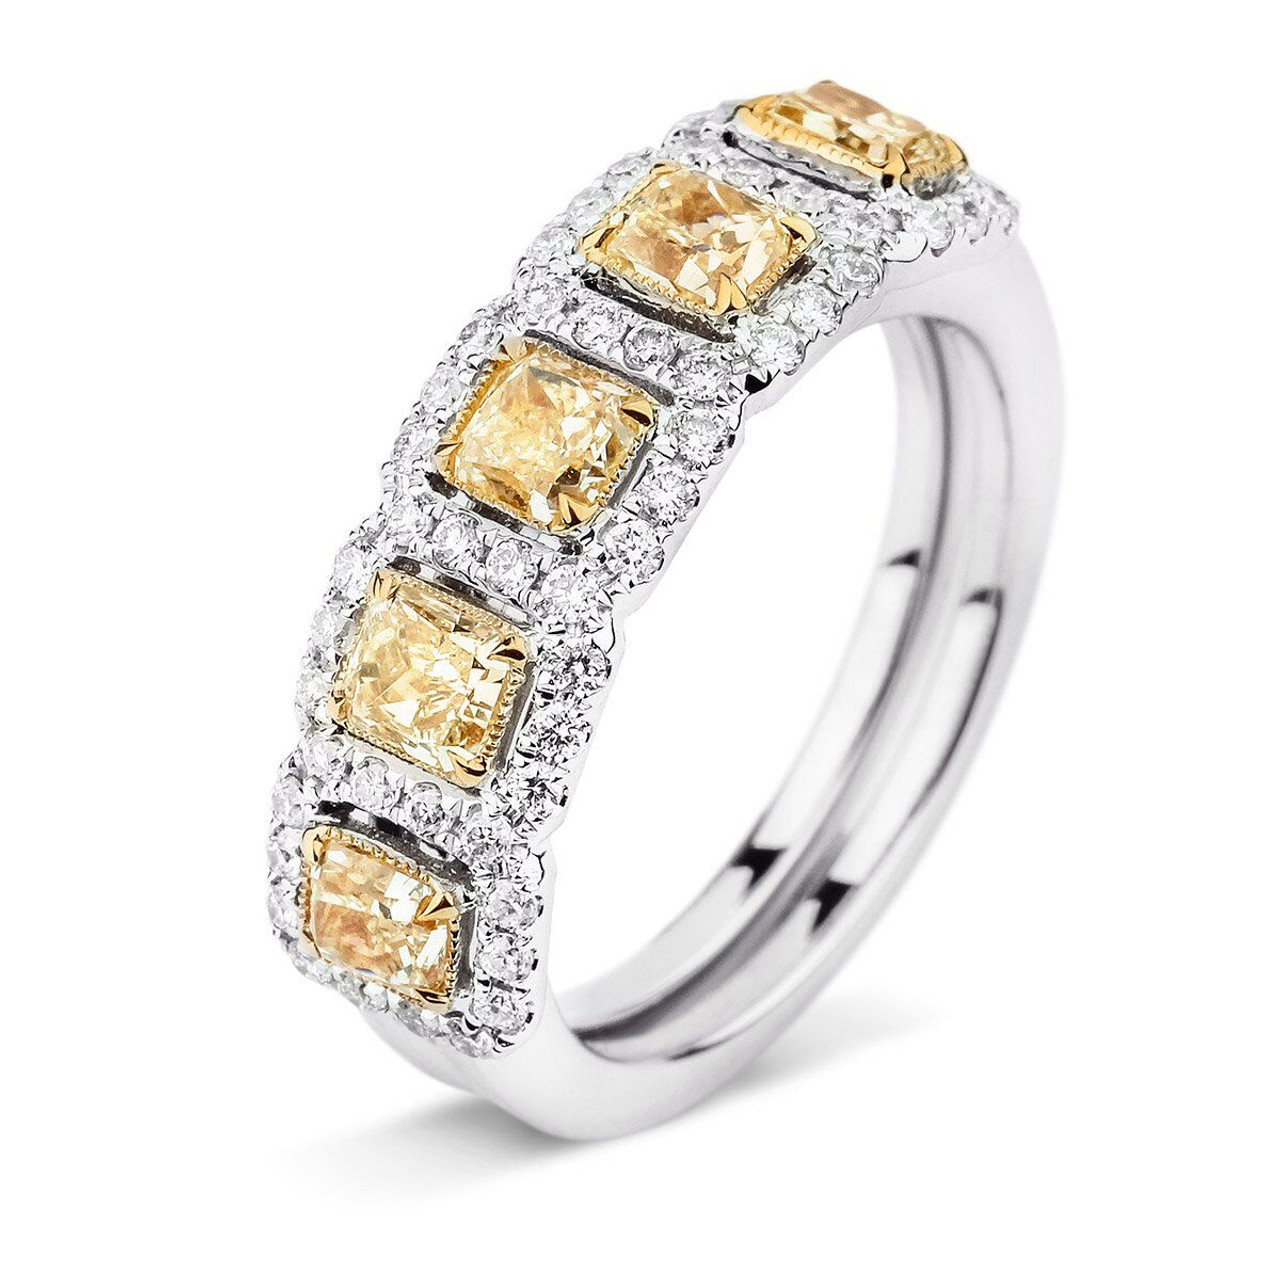 18kt White And Yellow Gold 5 Stone Diamond Halo Band